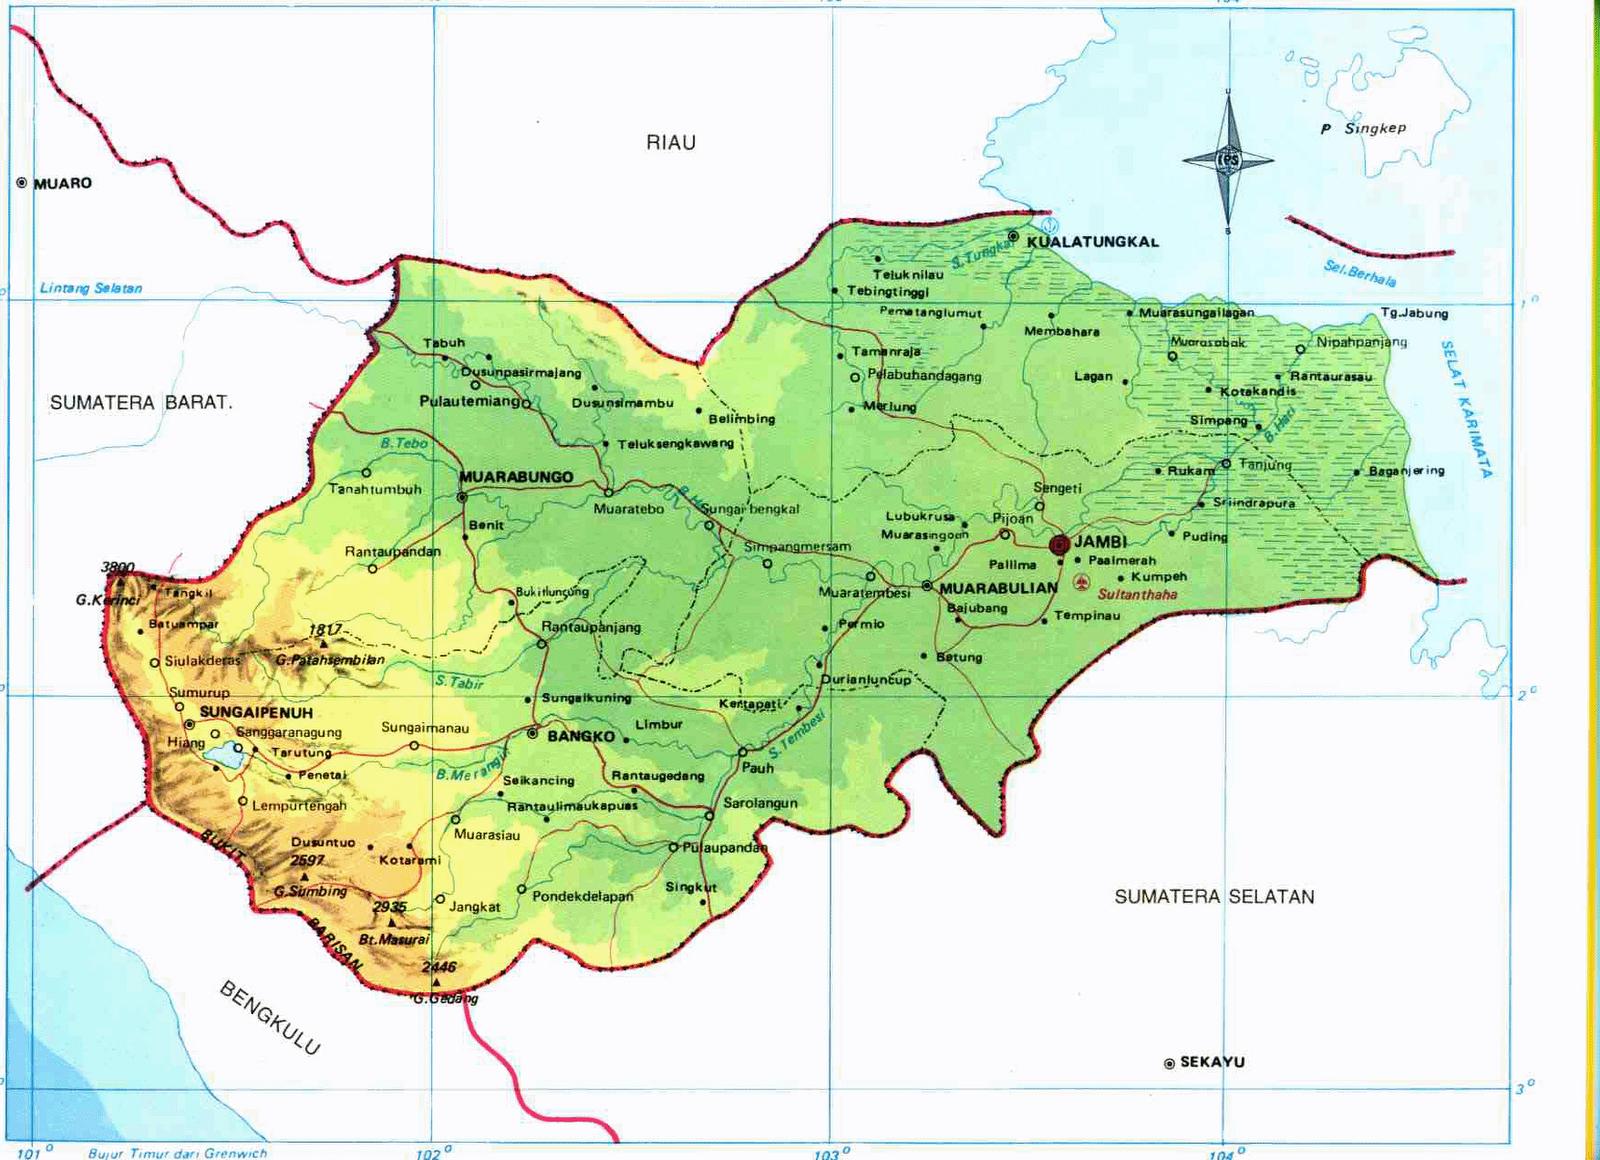 Daftar Nama Tempat Wisata di Jambi - Yoshiewafa